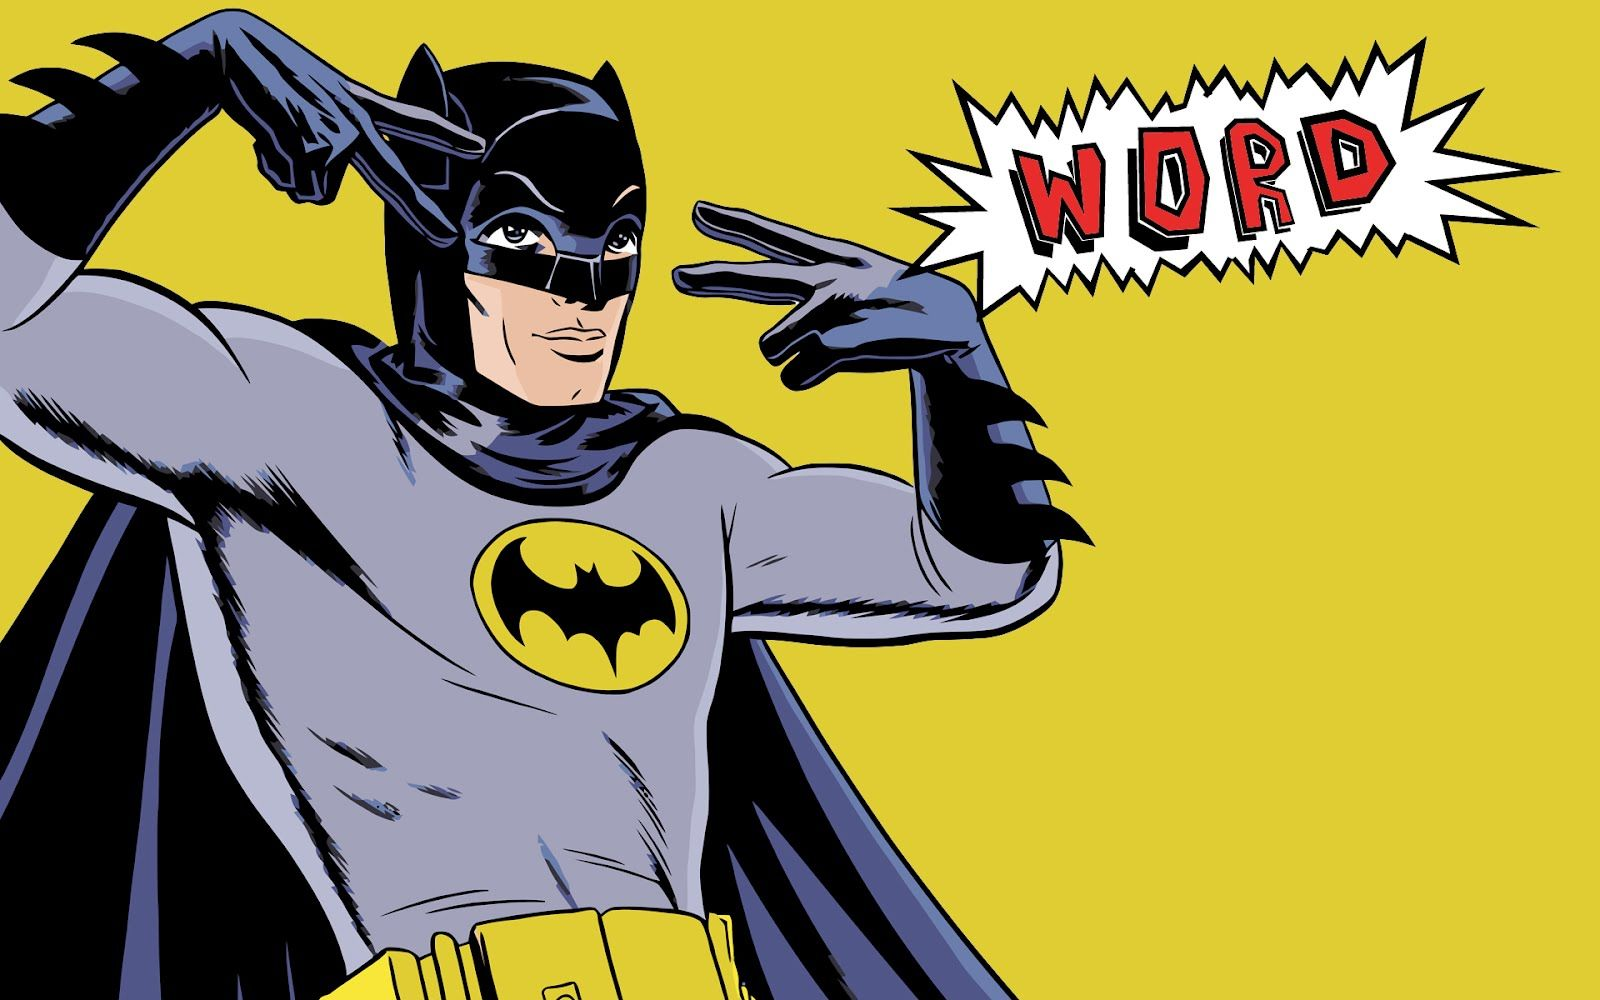 Google themes meme - We Are Anonymous Batman Meme Google Search